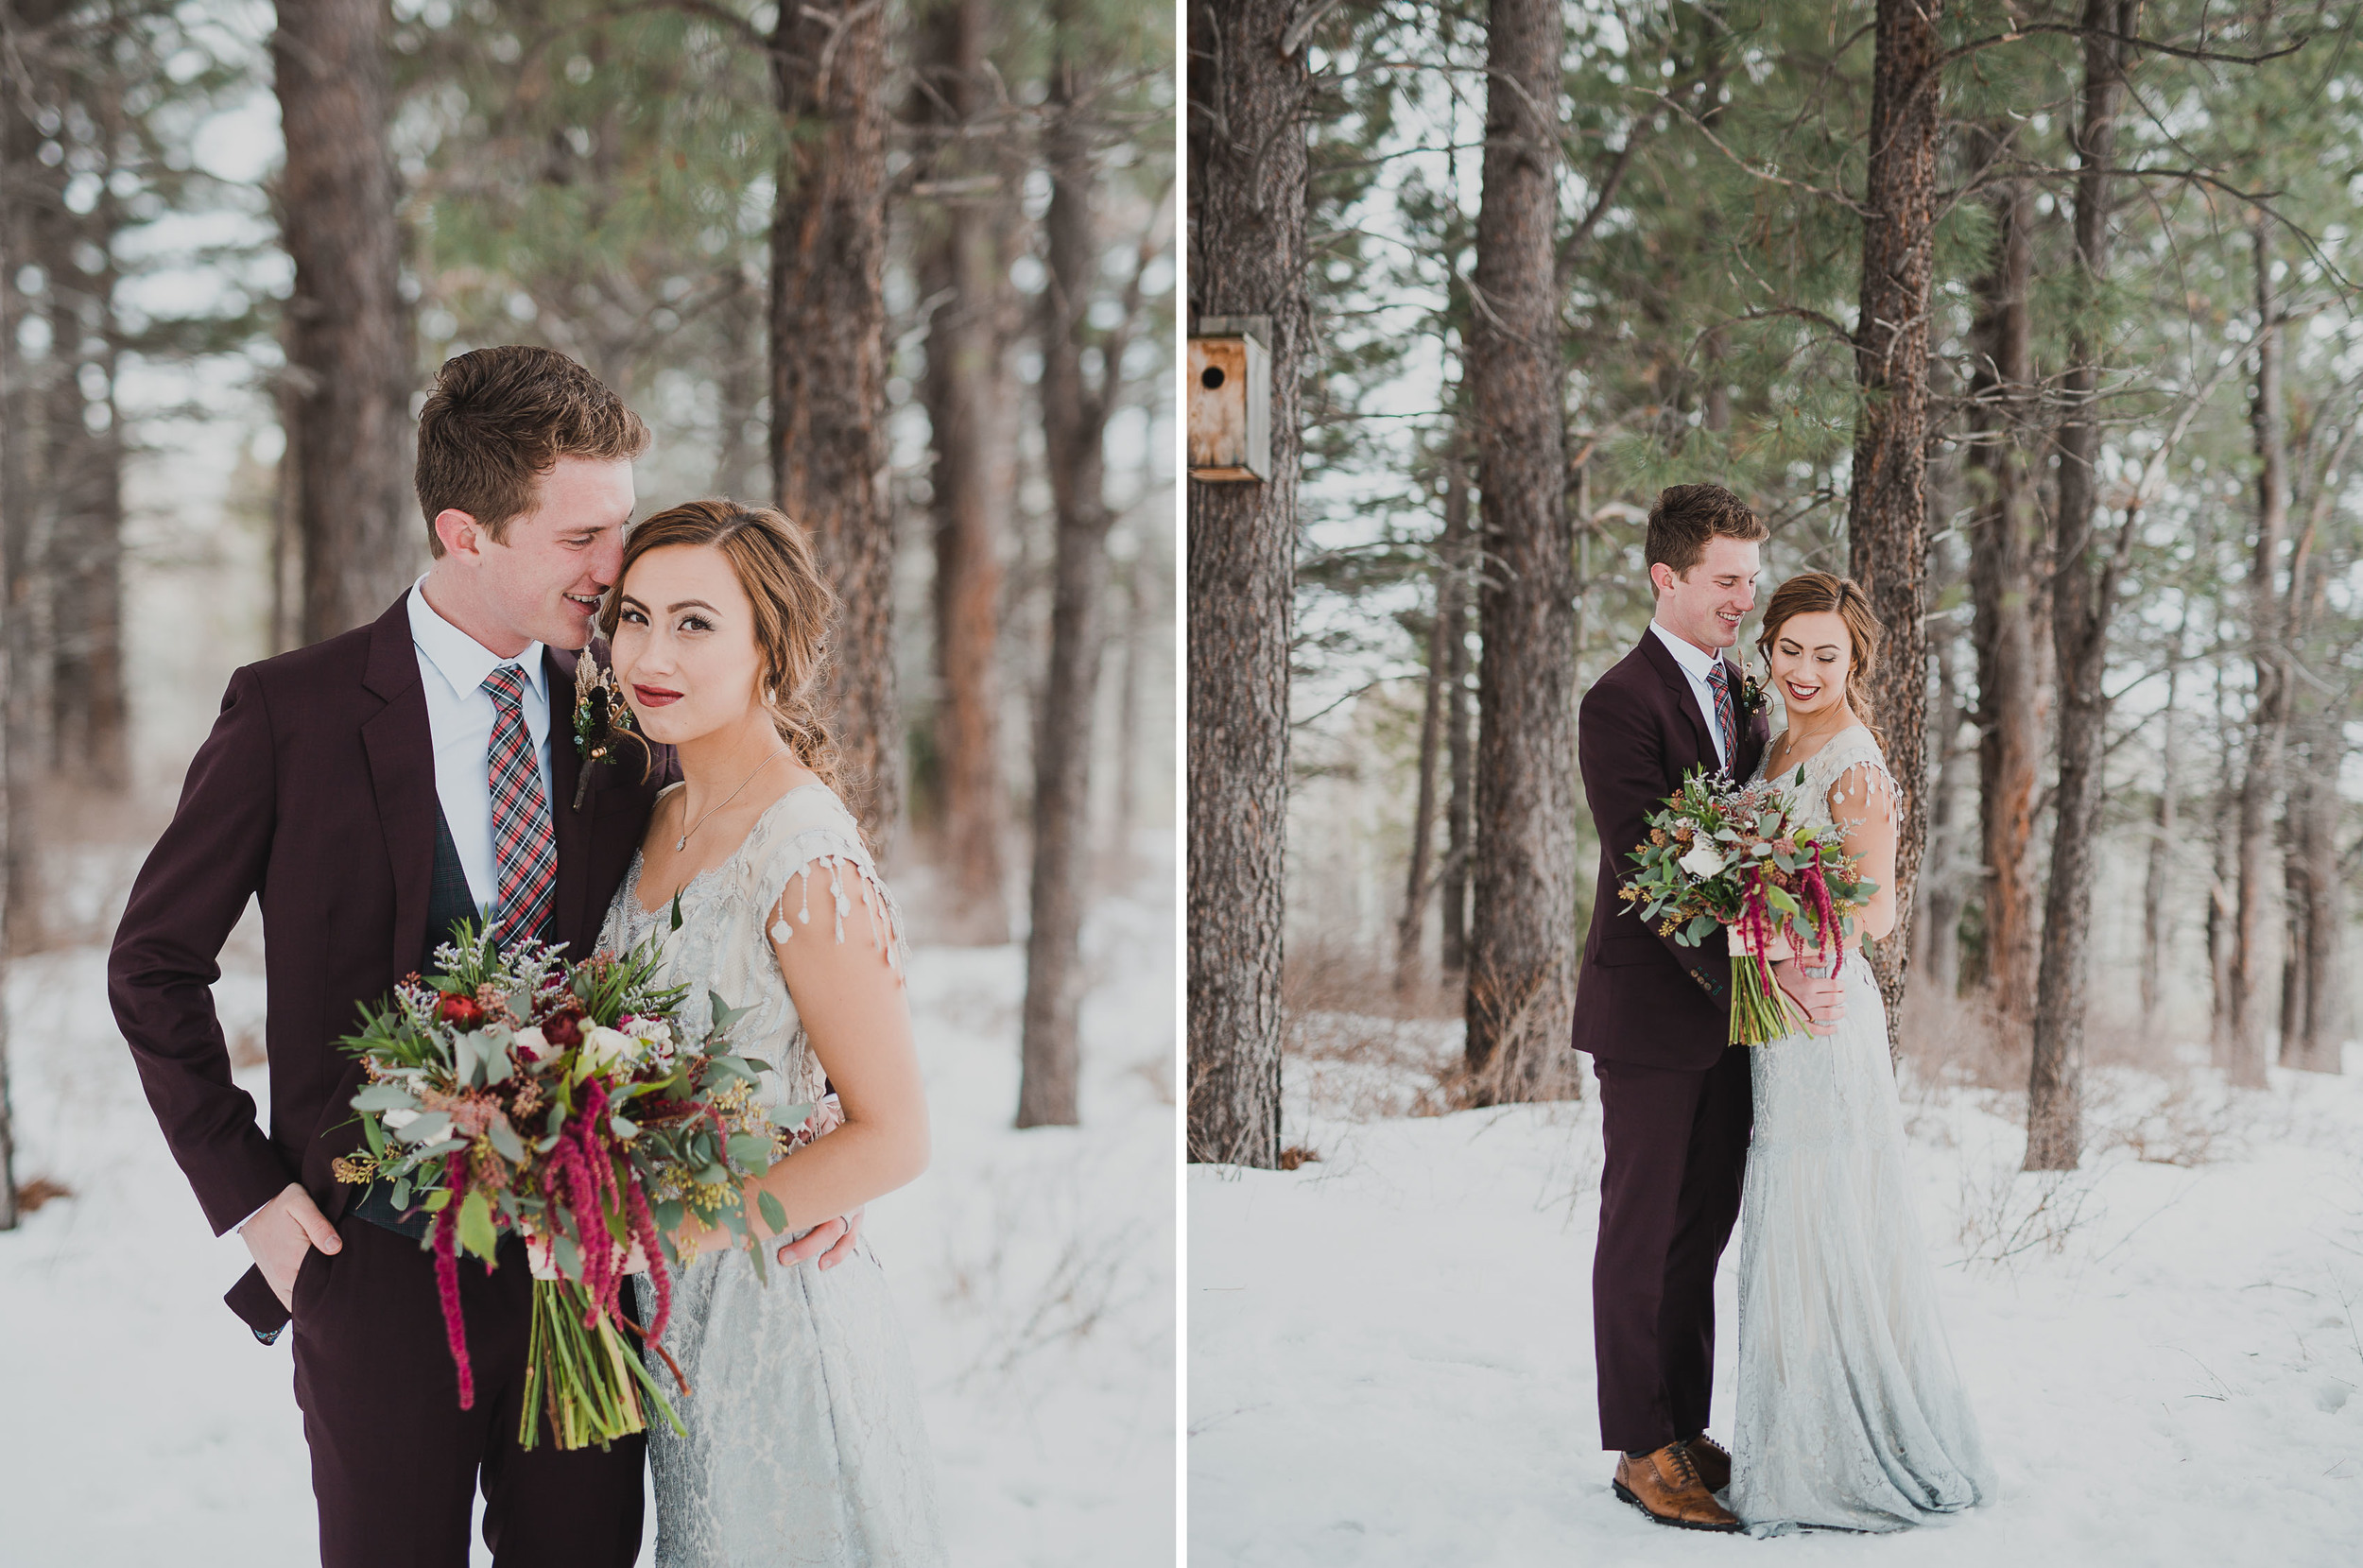 Salt-Lake-City-Utah-Wedding-Photographer-03.jpg